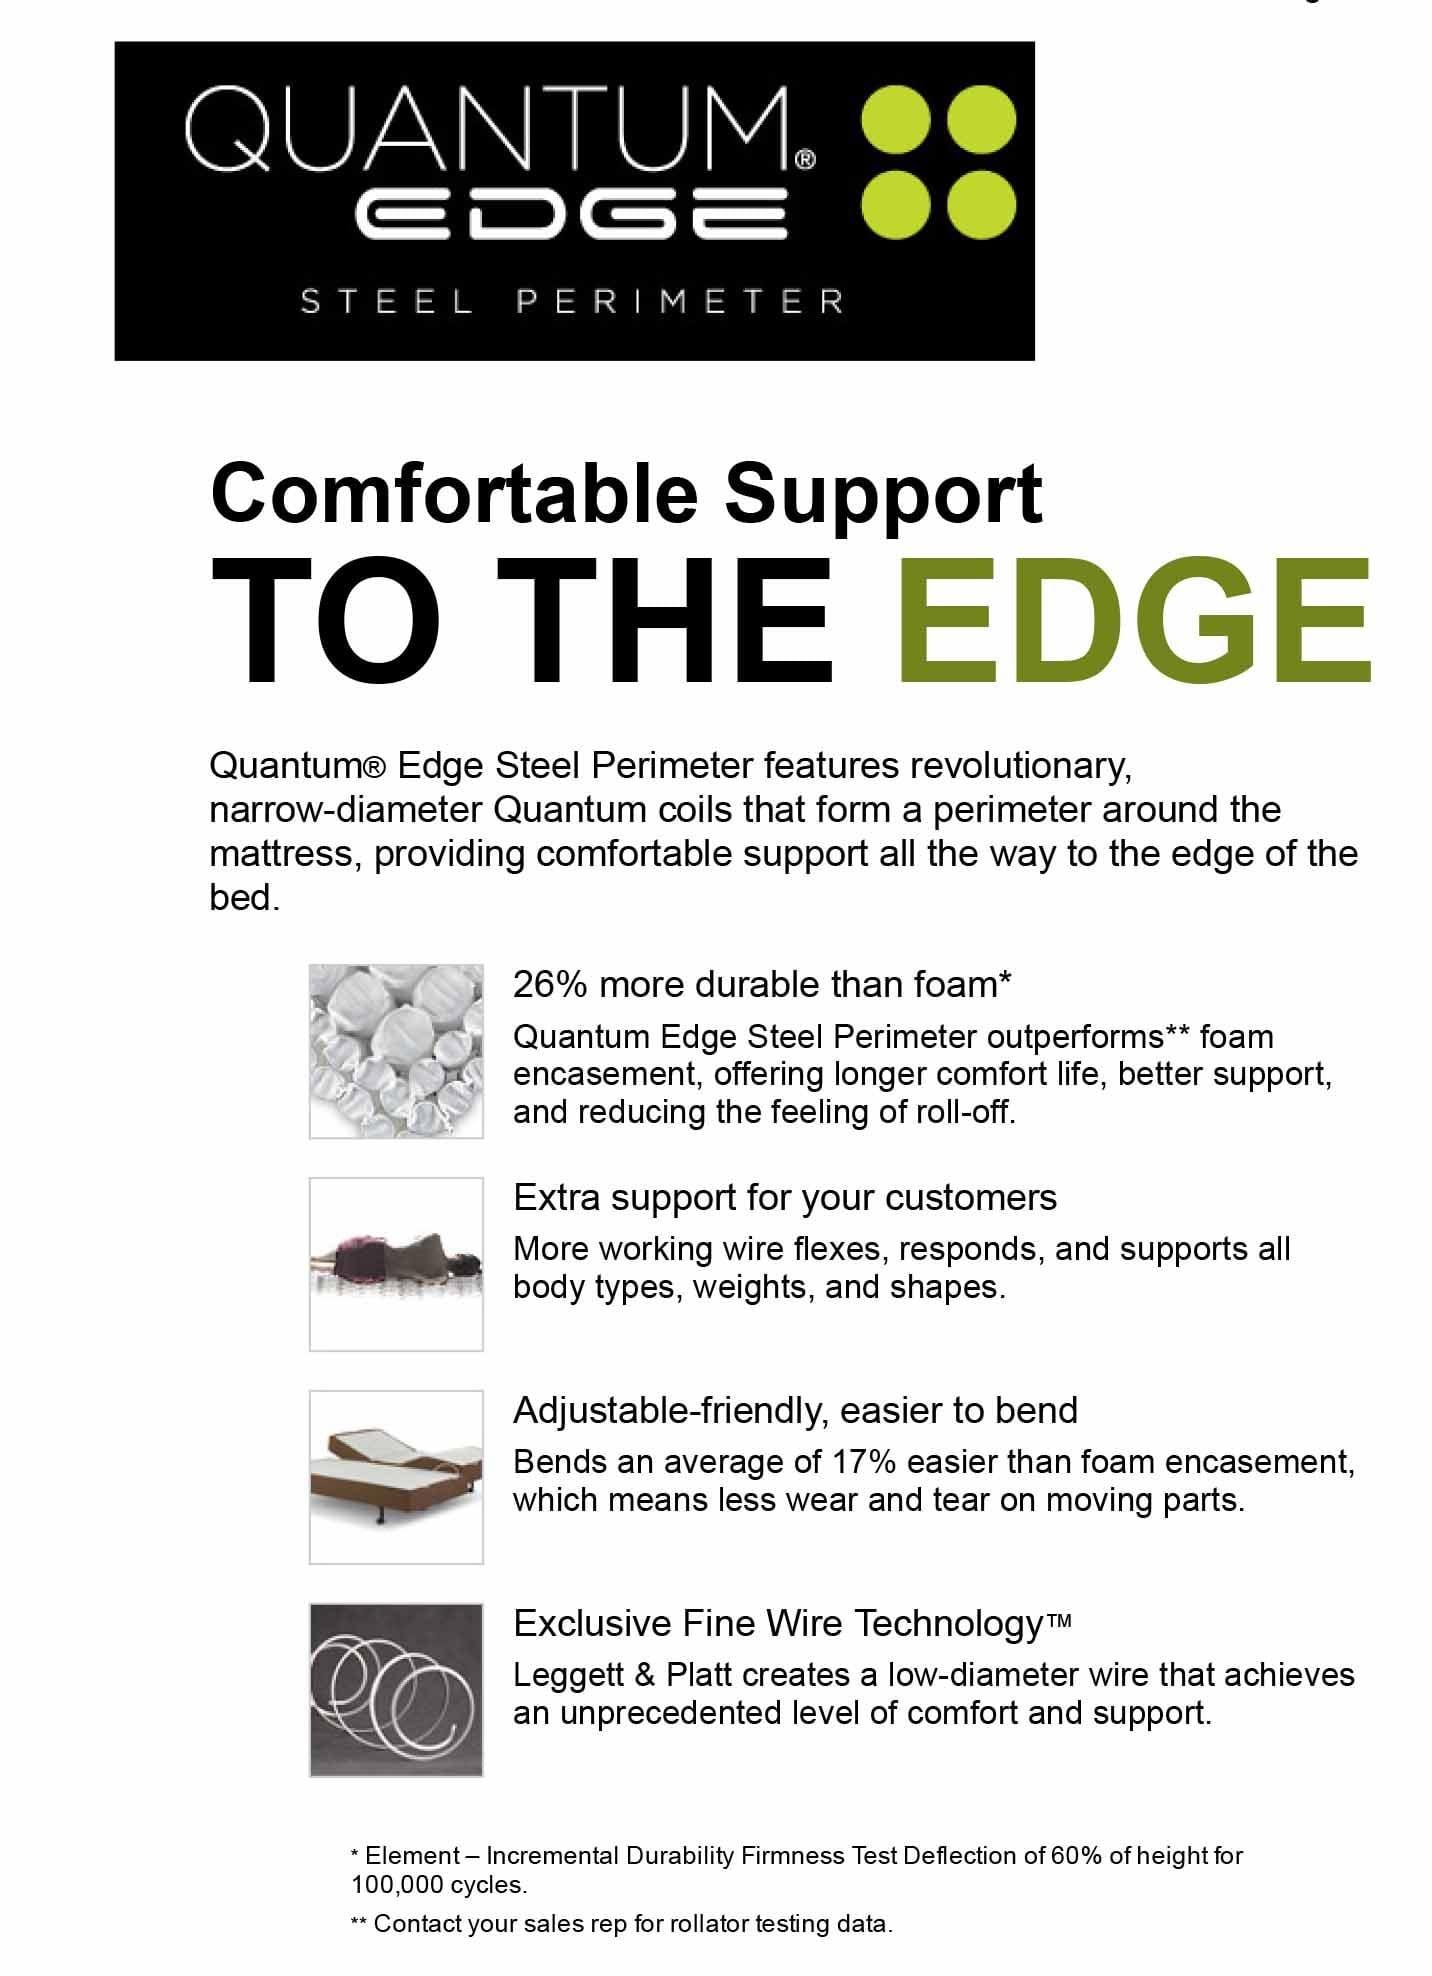 Quantum Edge Pocket Coil info